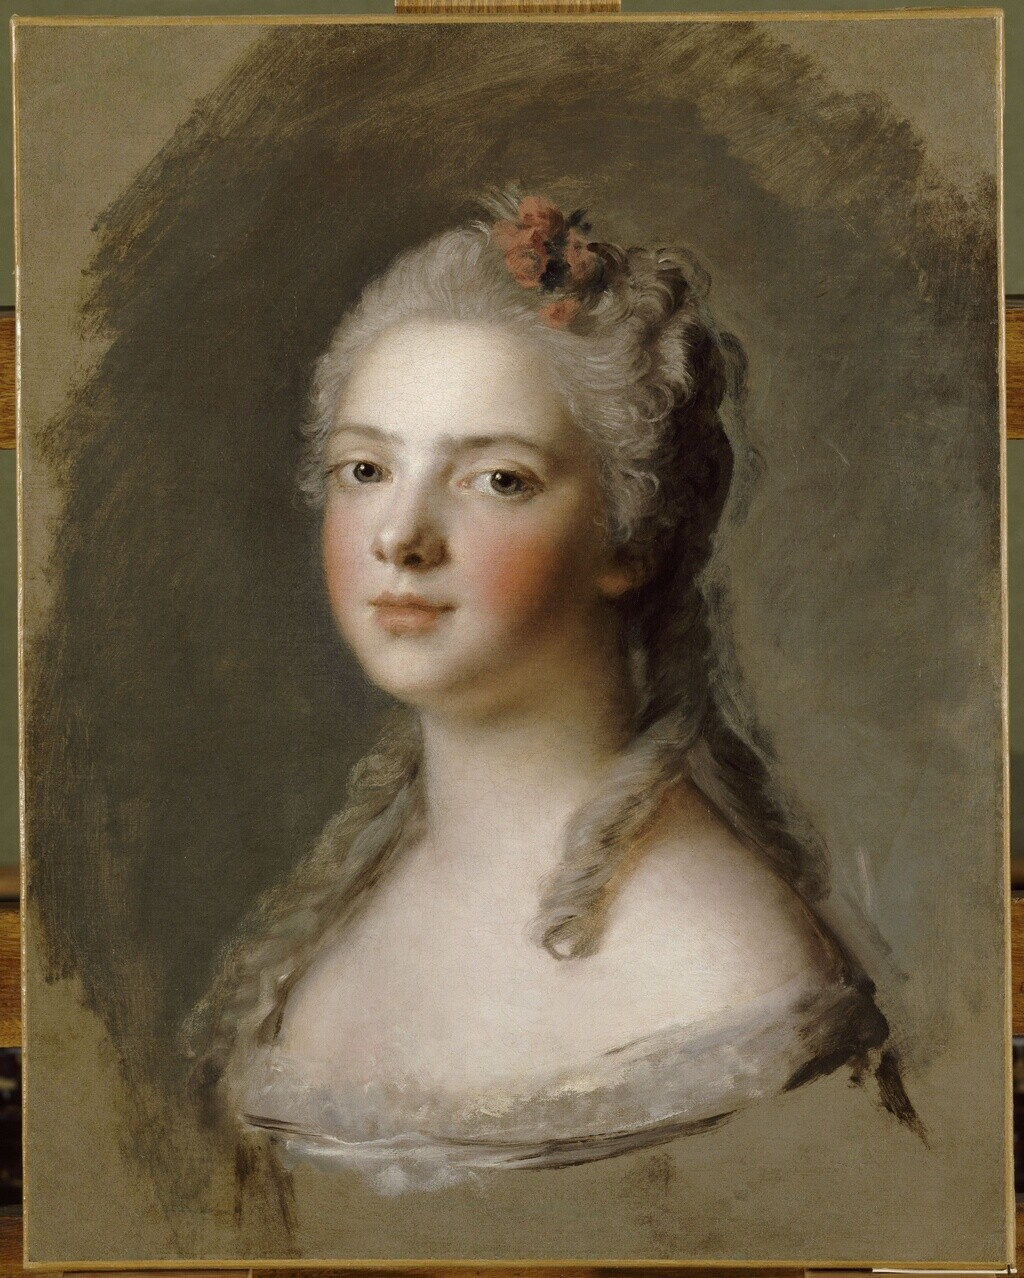 Marie-Adélaïde de France, dite Madame Adélaïde - Page 2 Imagep86